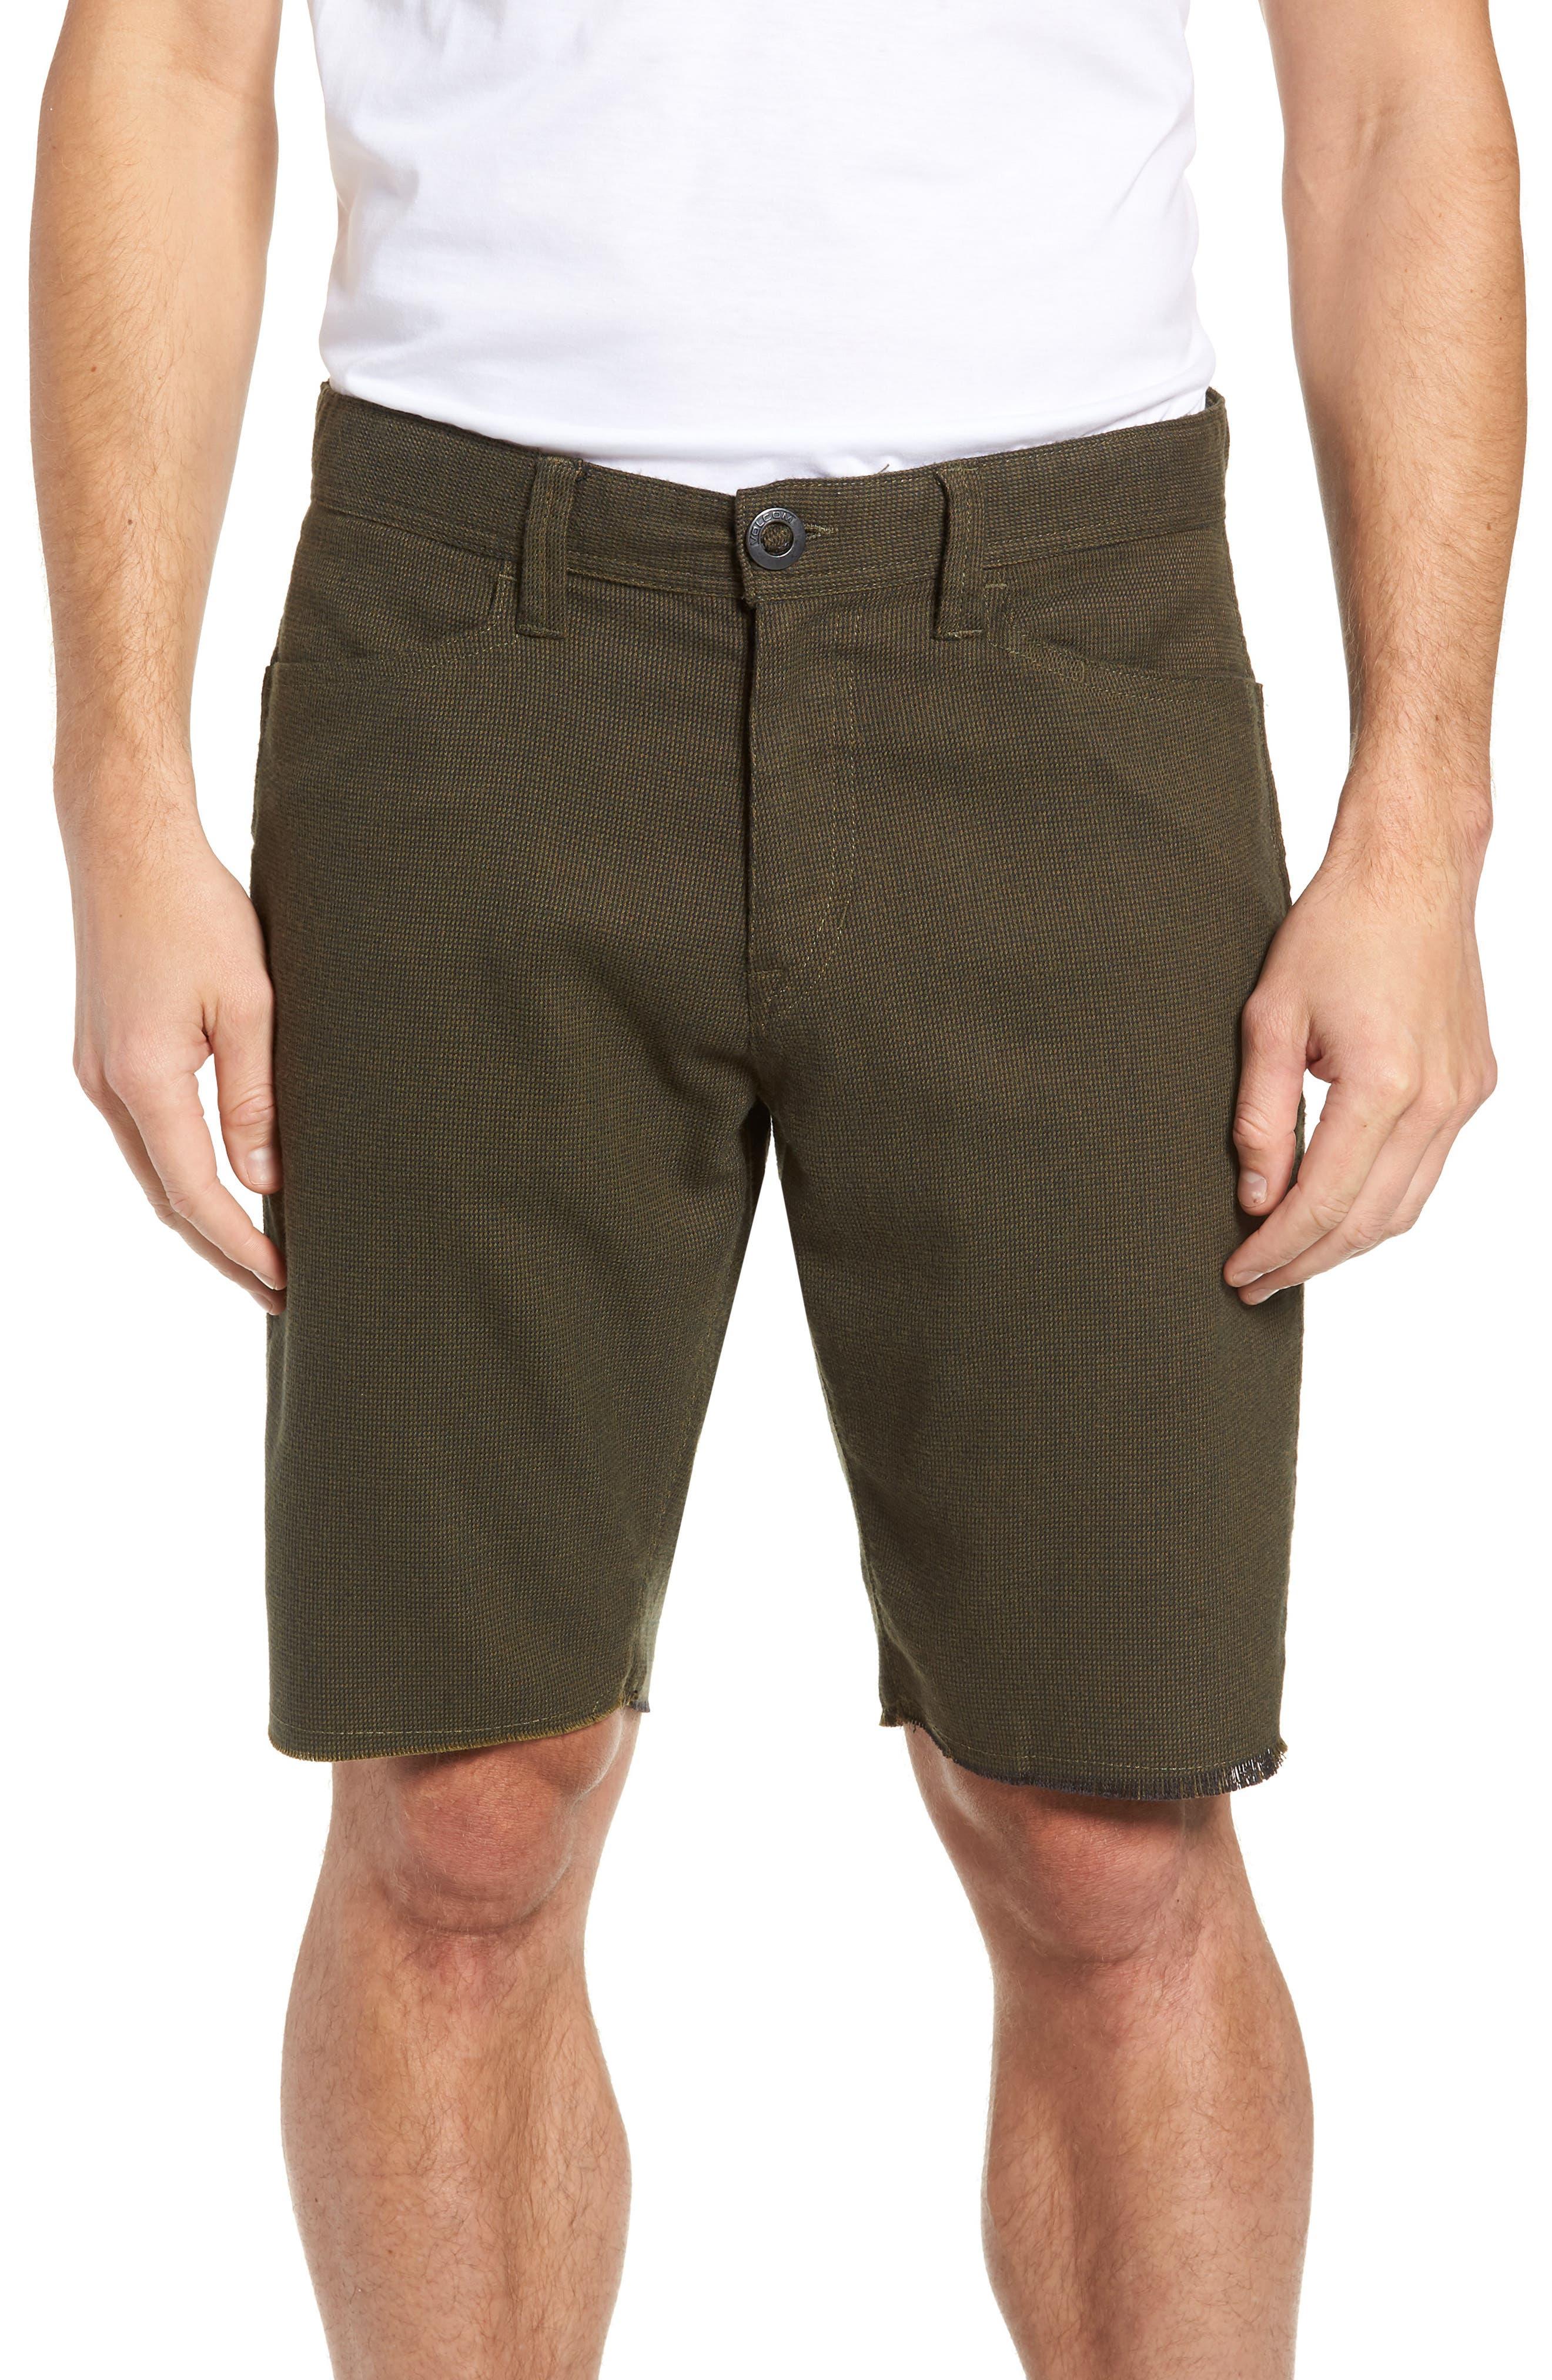 Gritter Thrifter Shorts,                             Main thumbnail 1, color,                             GREENTEA